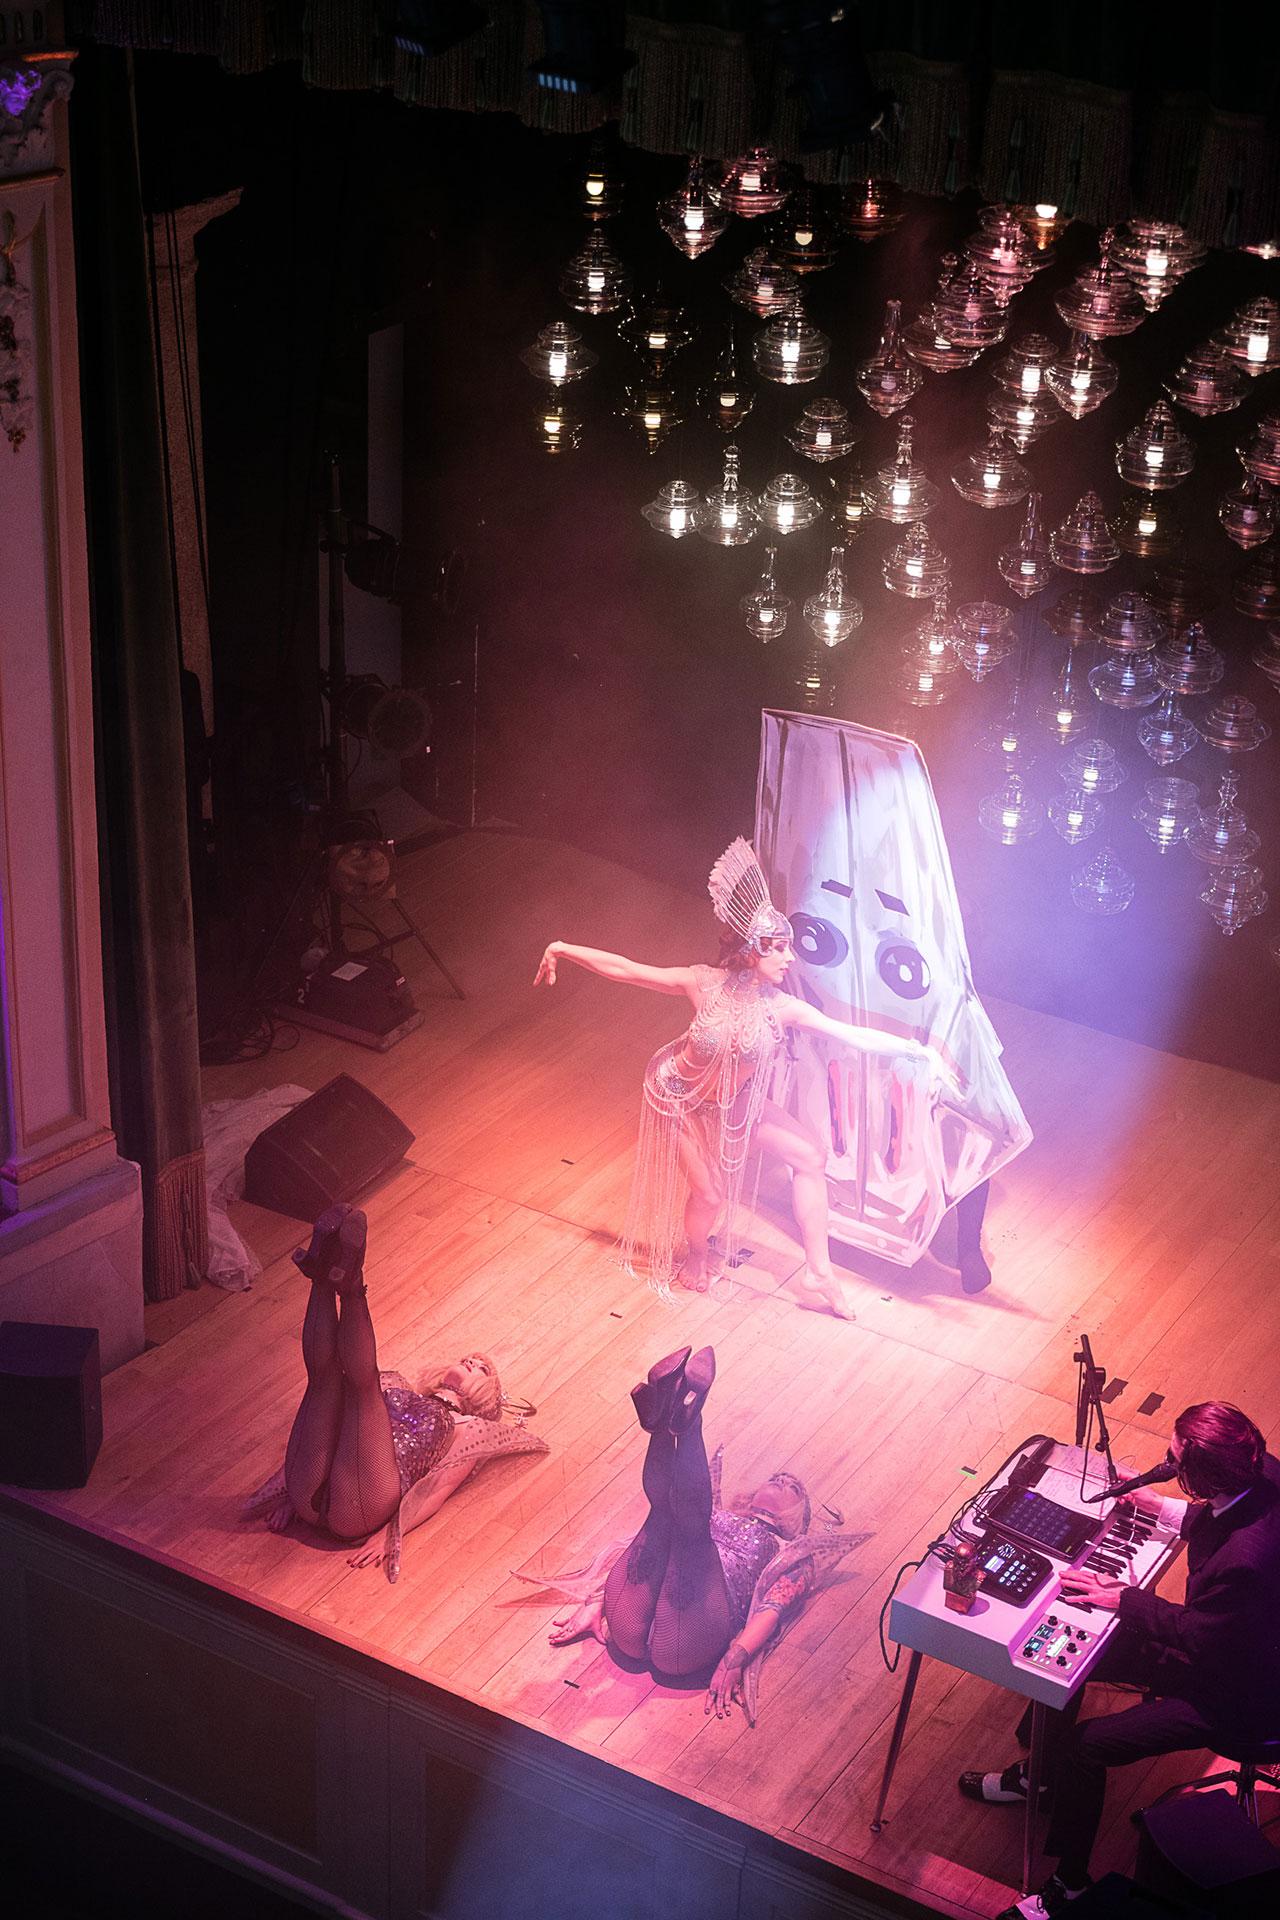 lasvit Monster Cabaret, A Phantasmagorical Show by Lasvit s5 lasvit monster cabaret milan teatro gerolamo yatzer